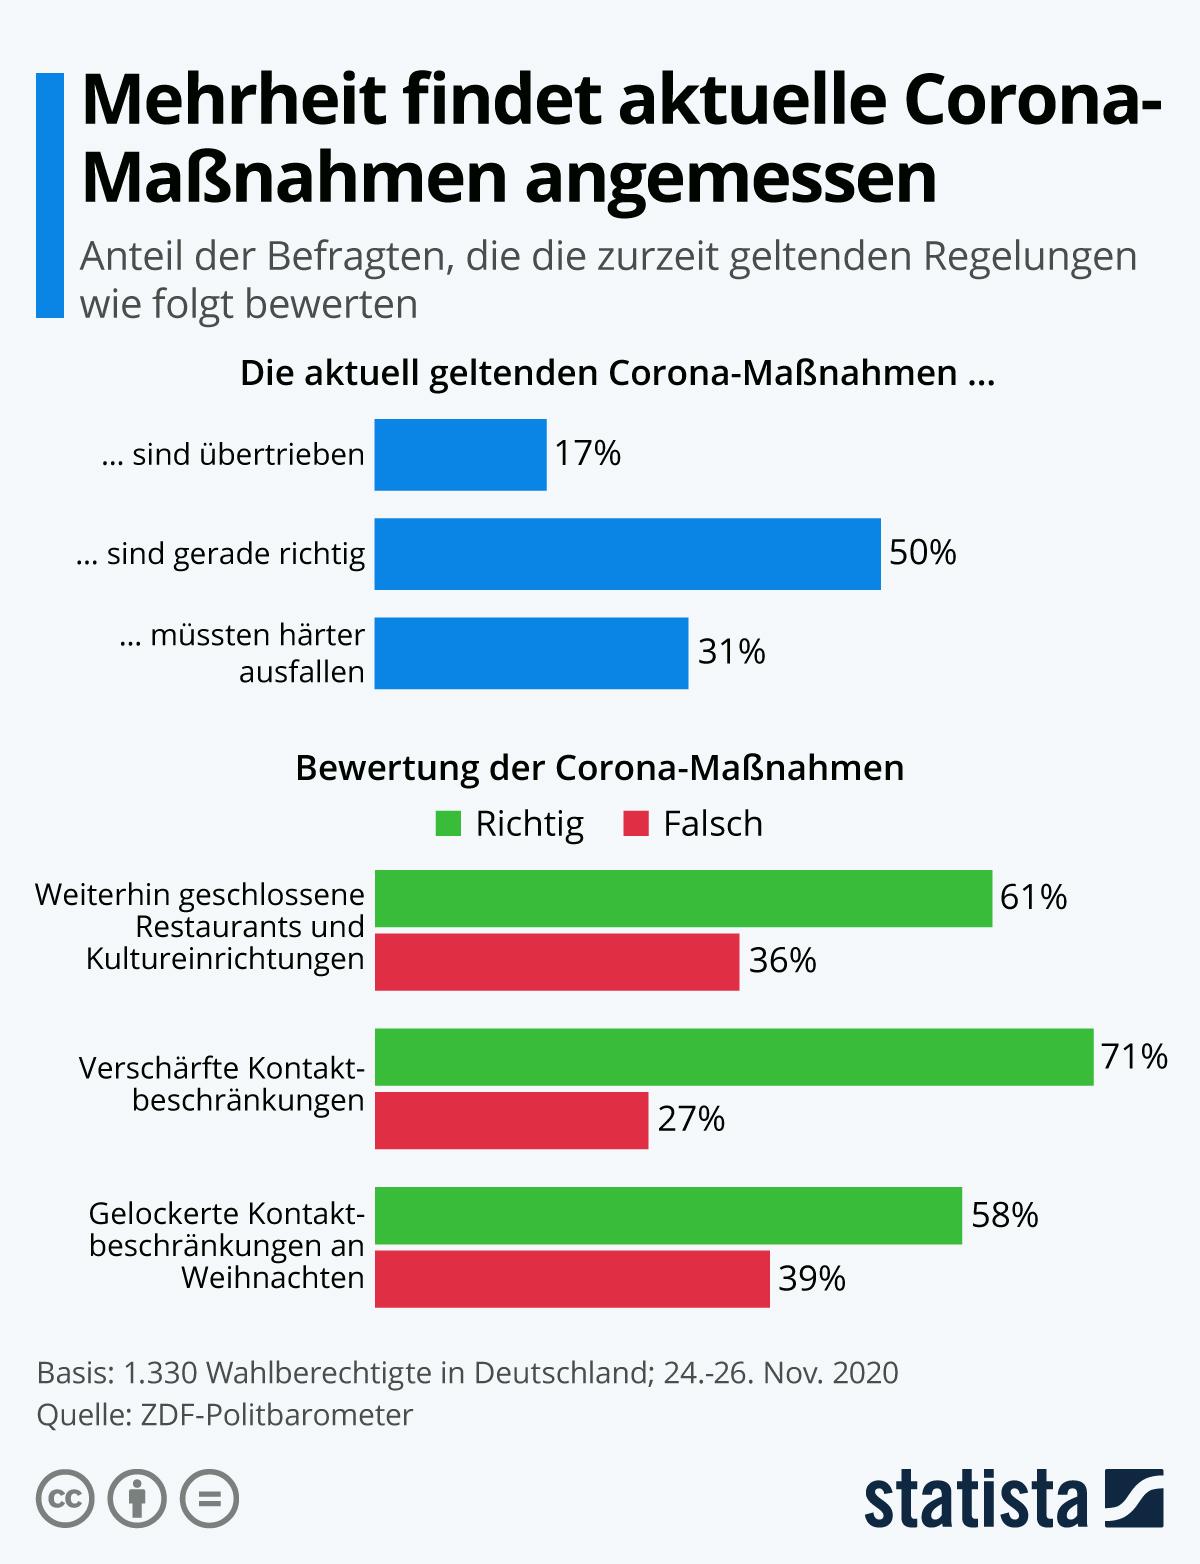 Infografik: Mehrheit findet aktuelle Corona-Maßnahmen angemessen | Statista